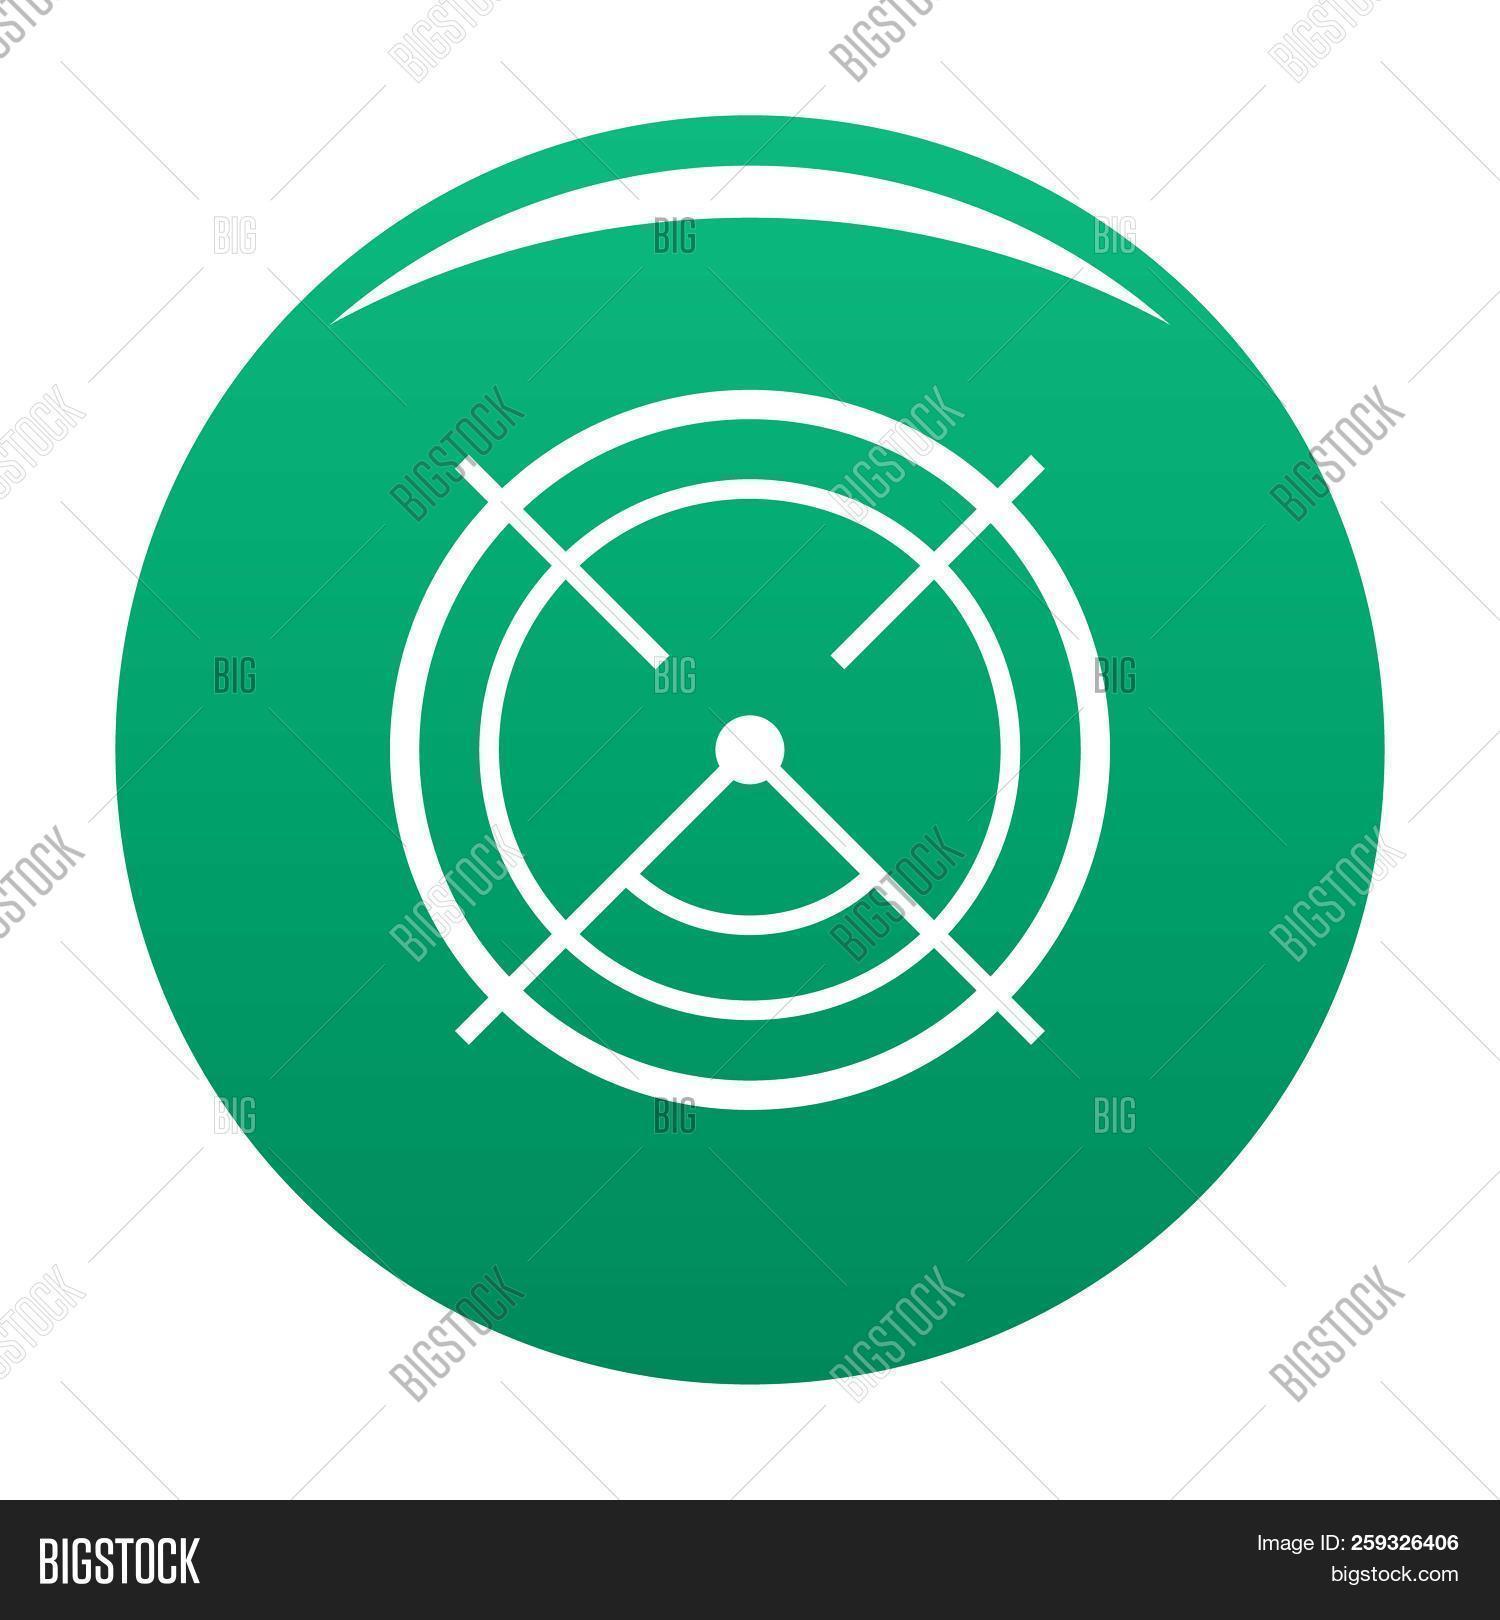 Aim Radar Icon Simple Image Photo Free Trial Bigstock